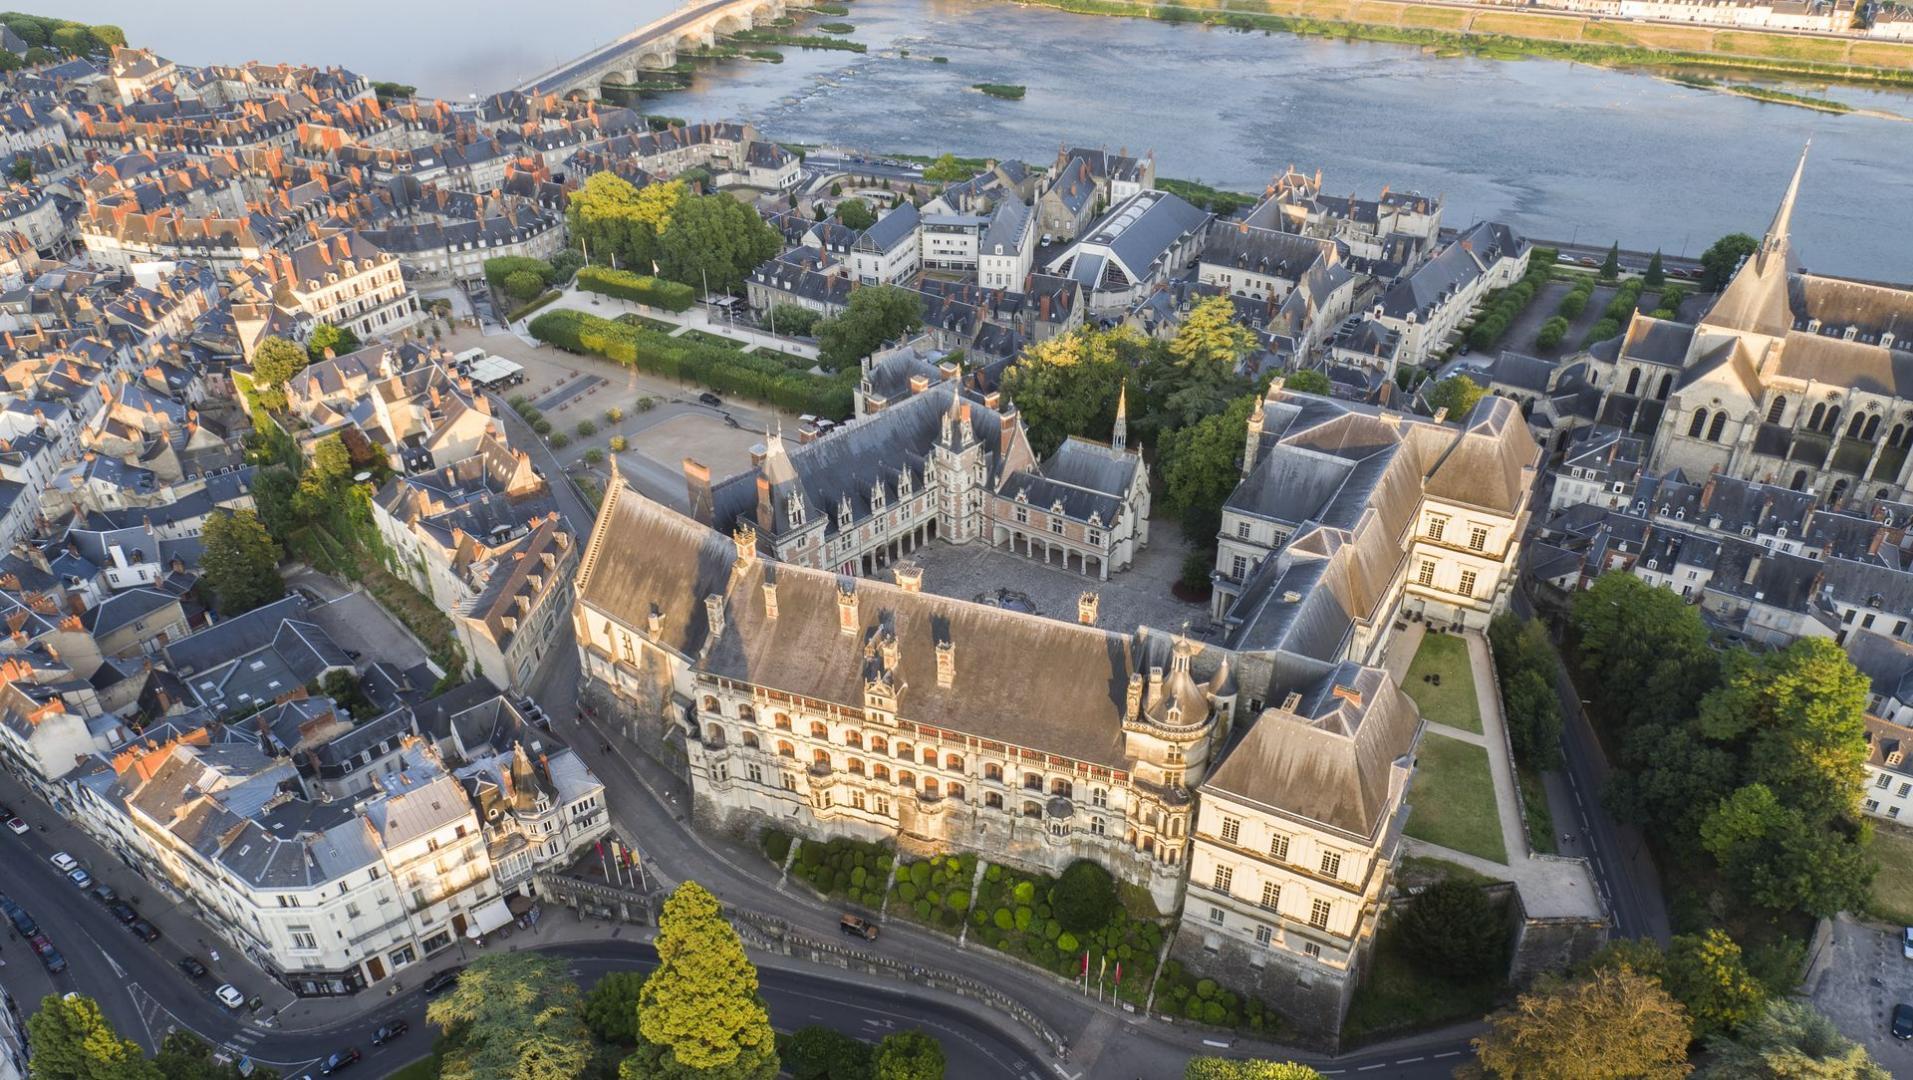 Fontevraud 王家修道院-昂布瓦兹 (Amboise)